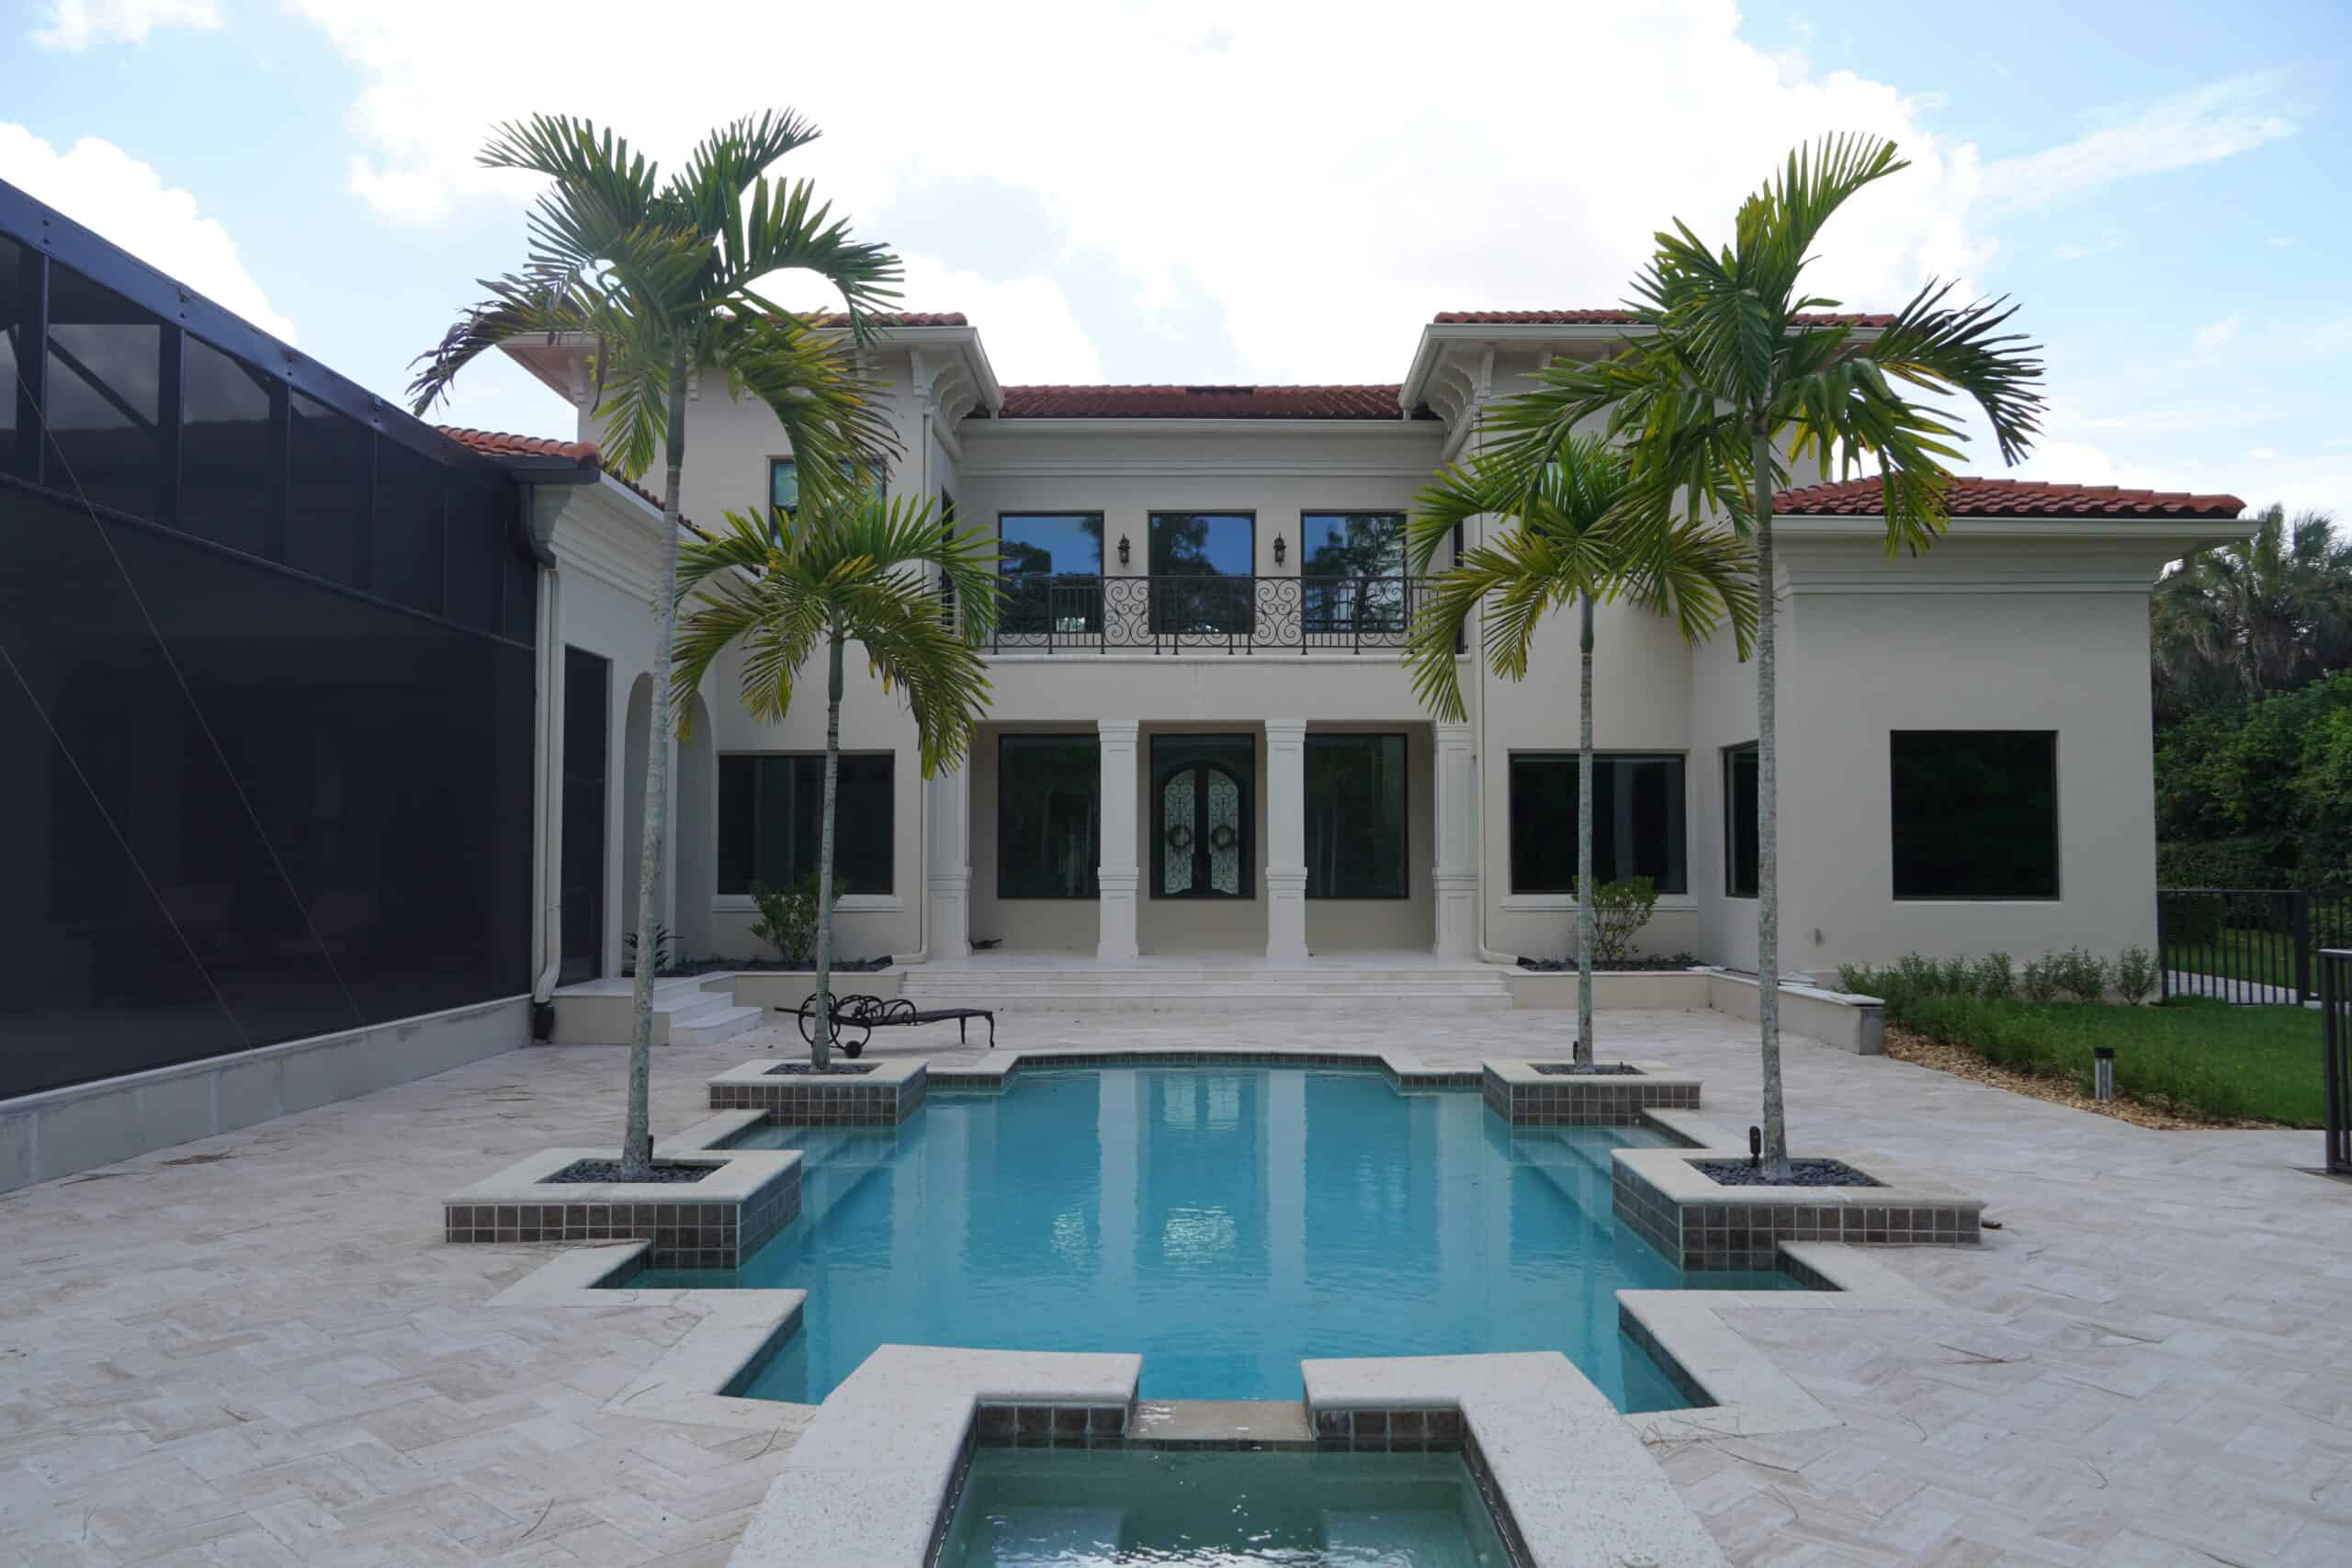 Naples Florida Travertine Pool Deck